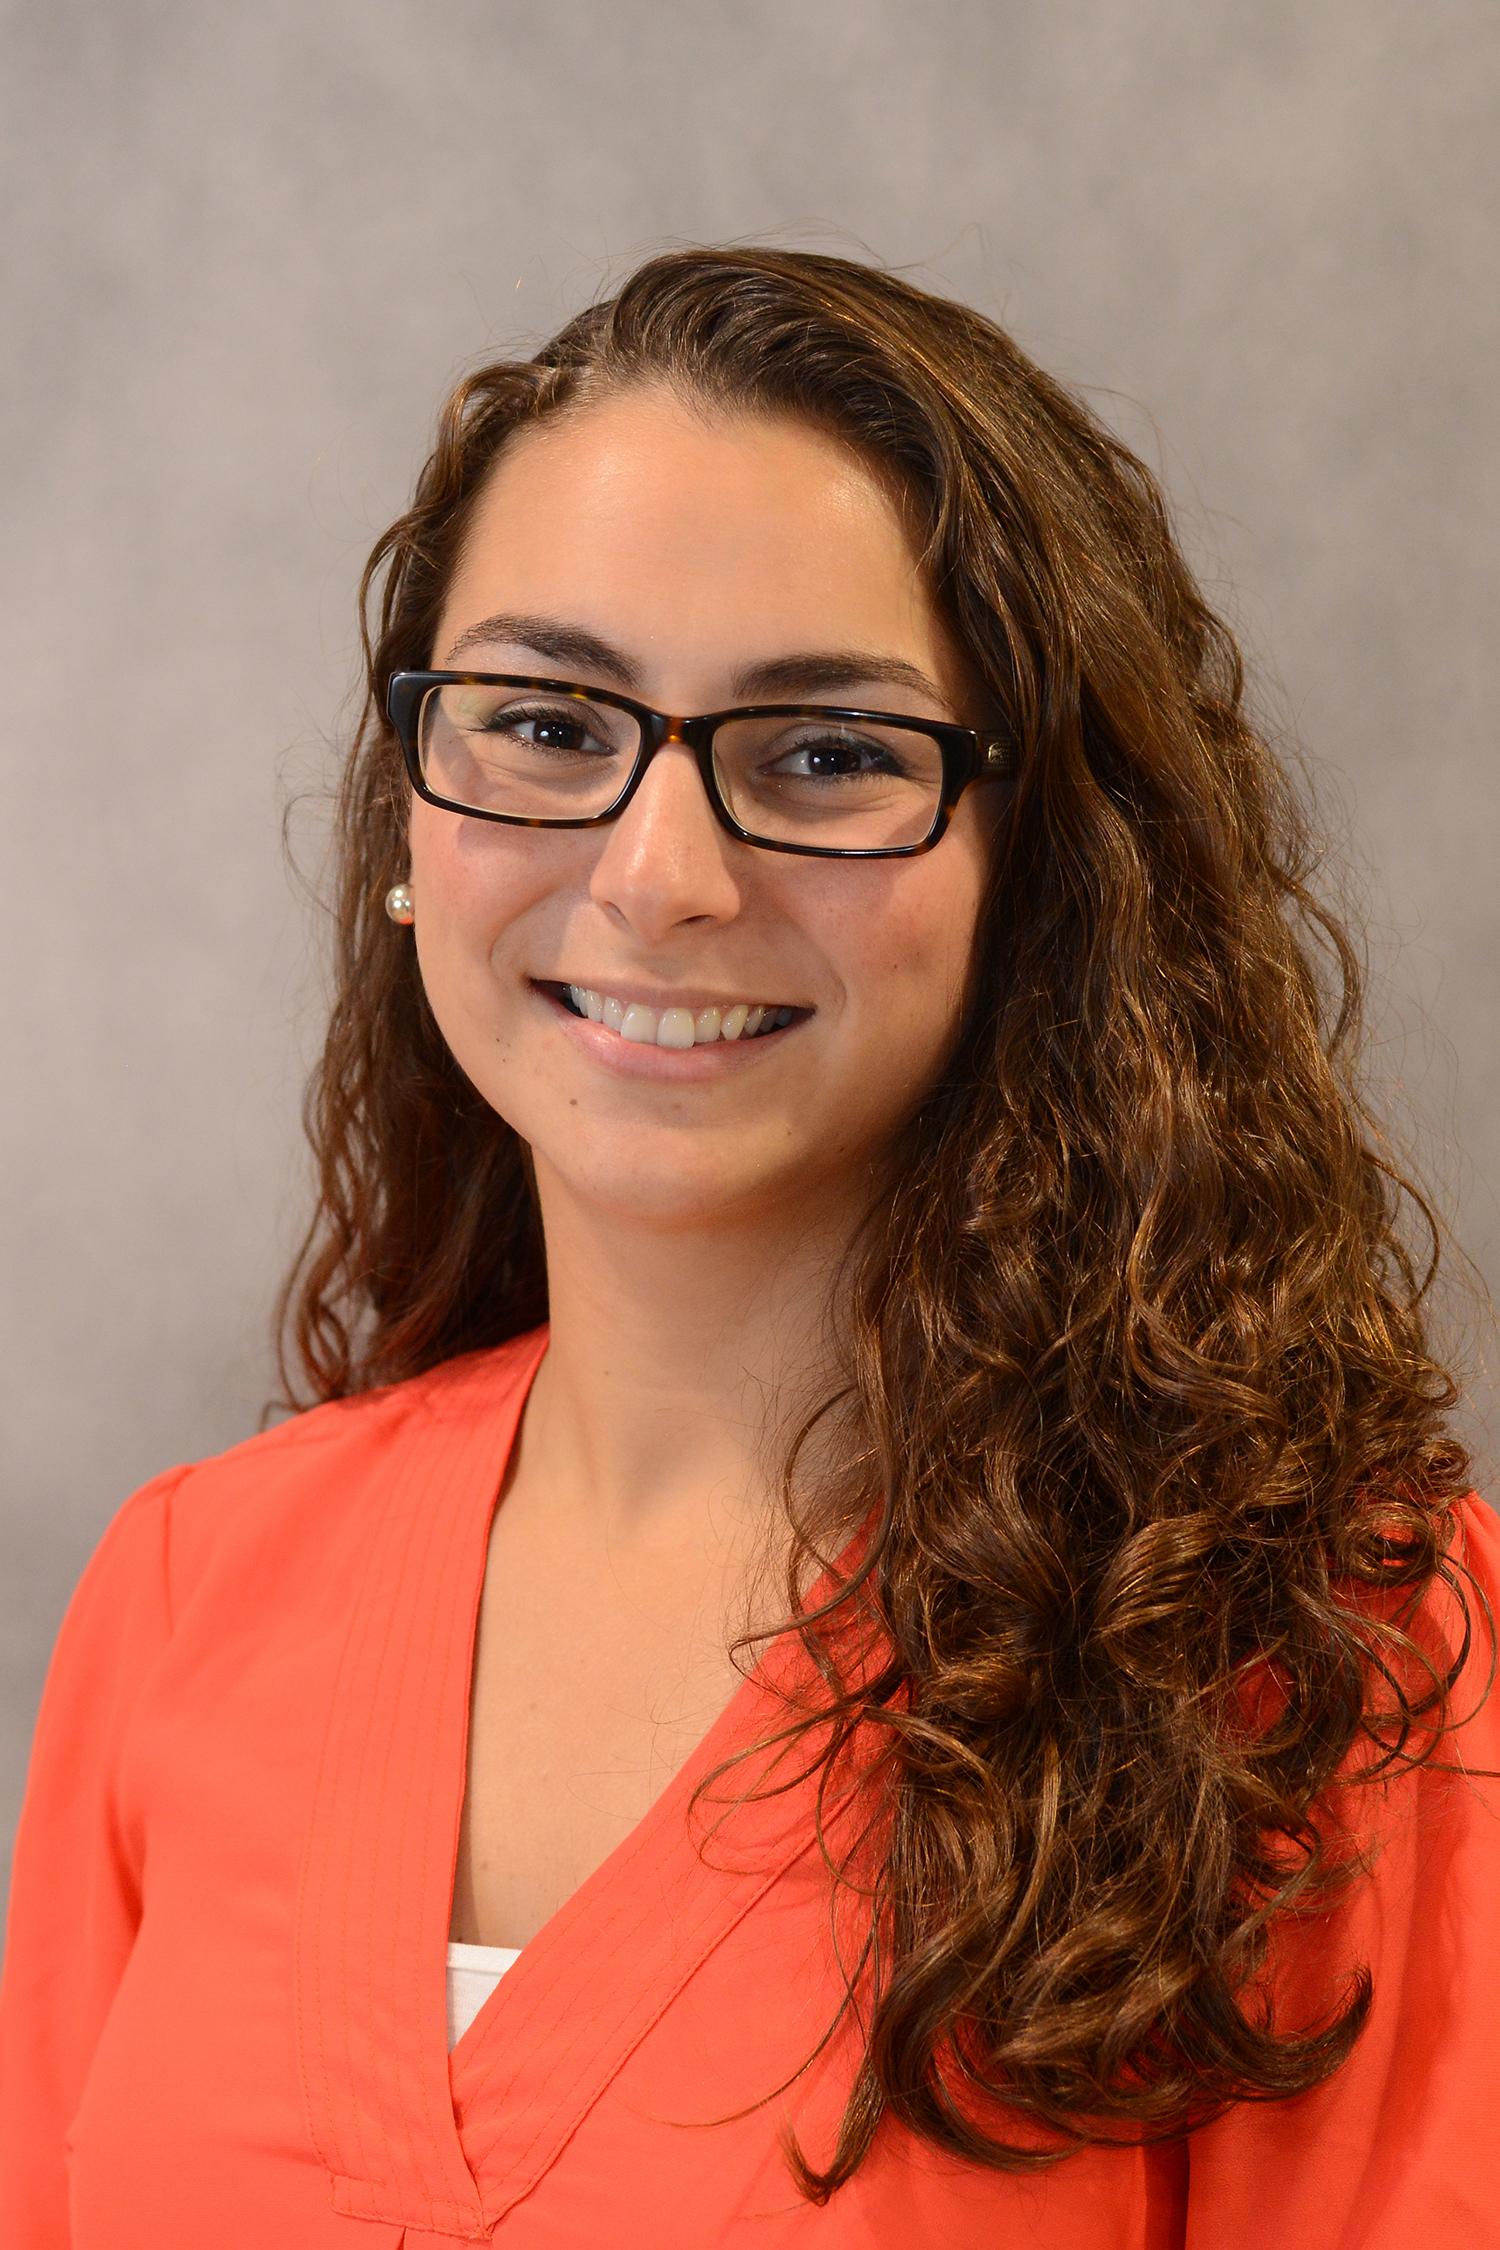 Allison Grella